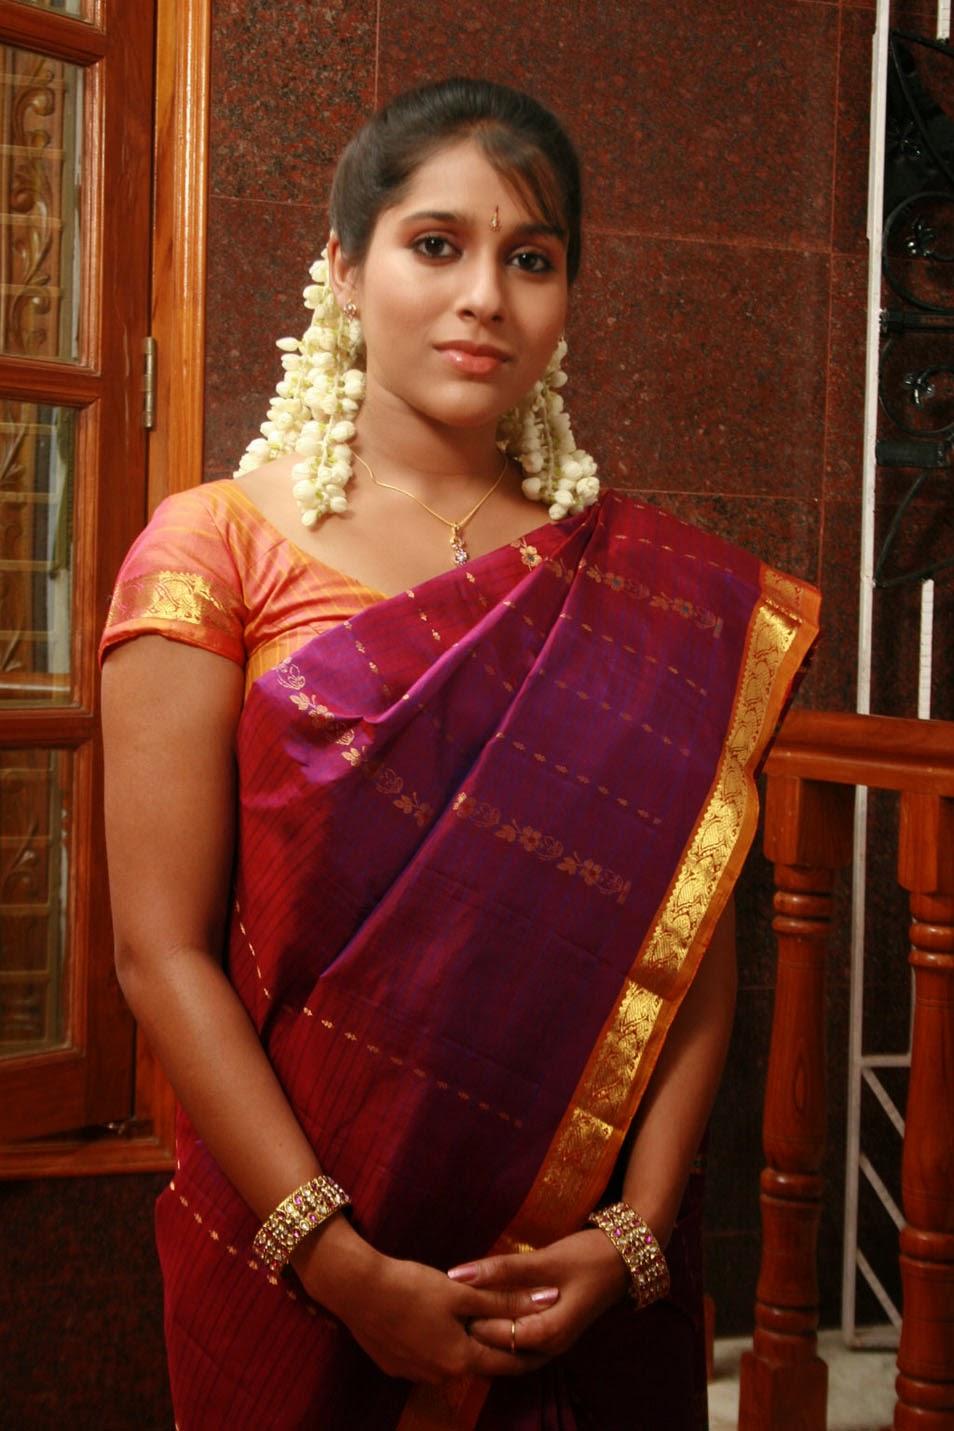 Rashmi Gautam hot saree stills - HIGH RESOLUTION PICTURES